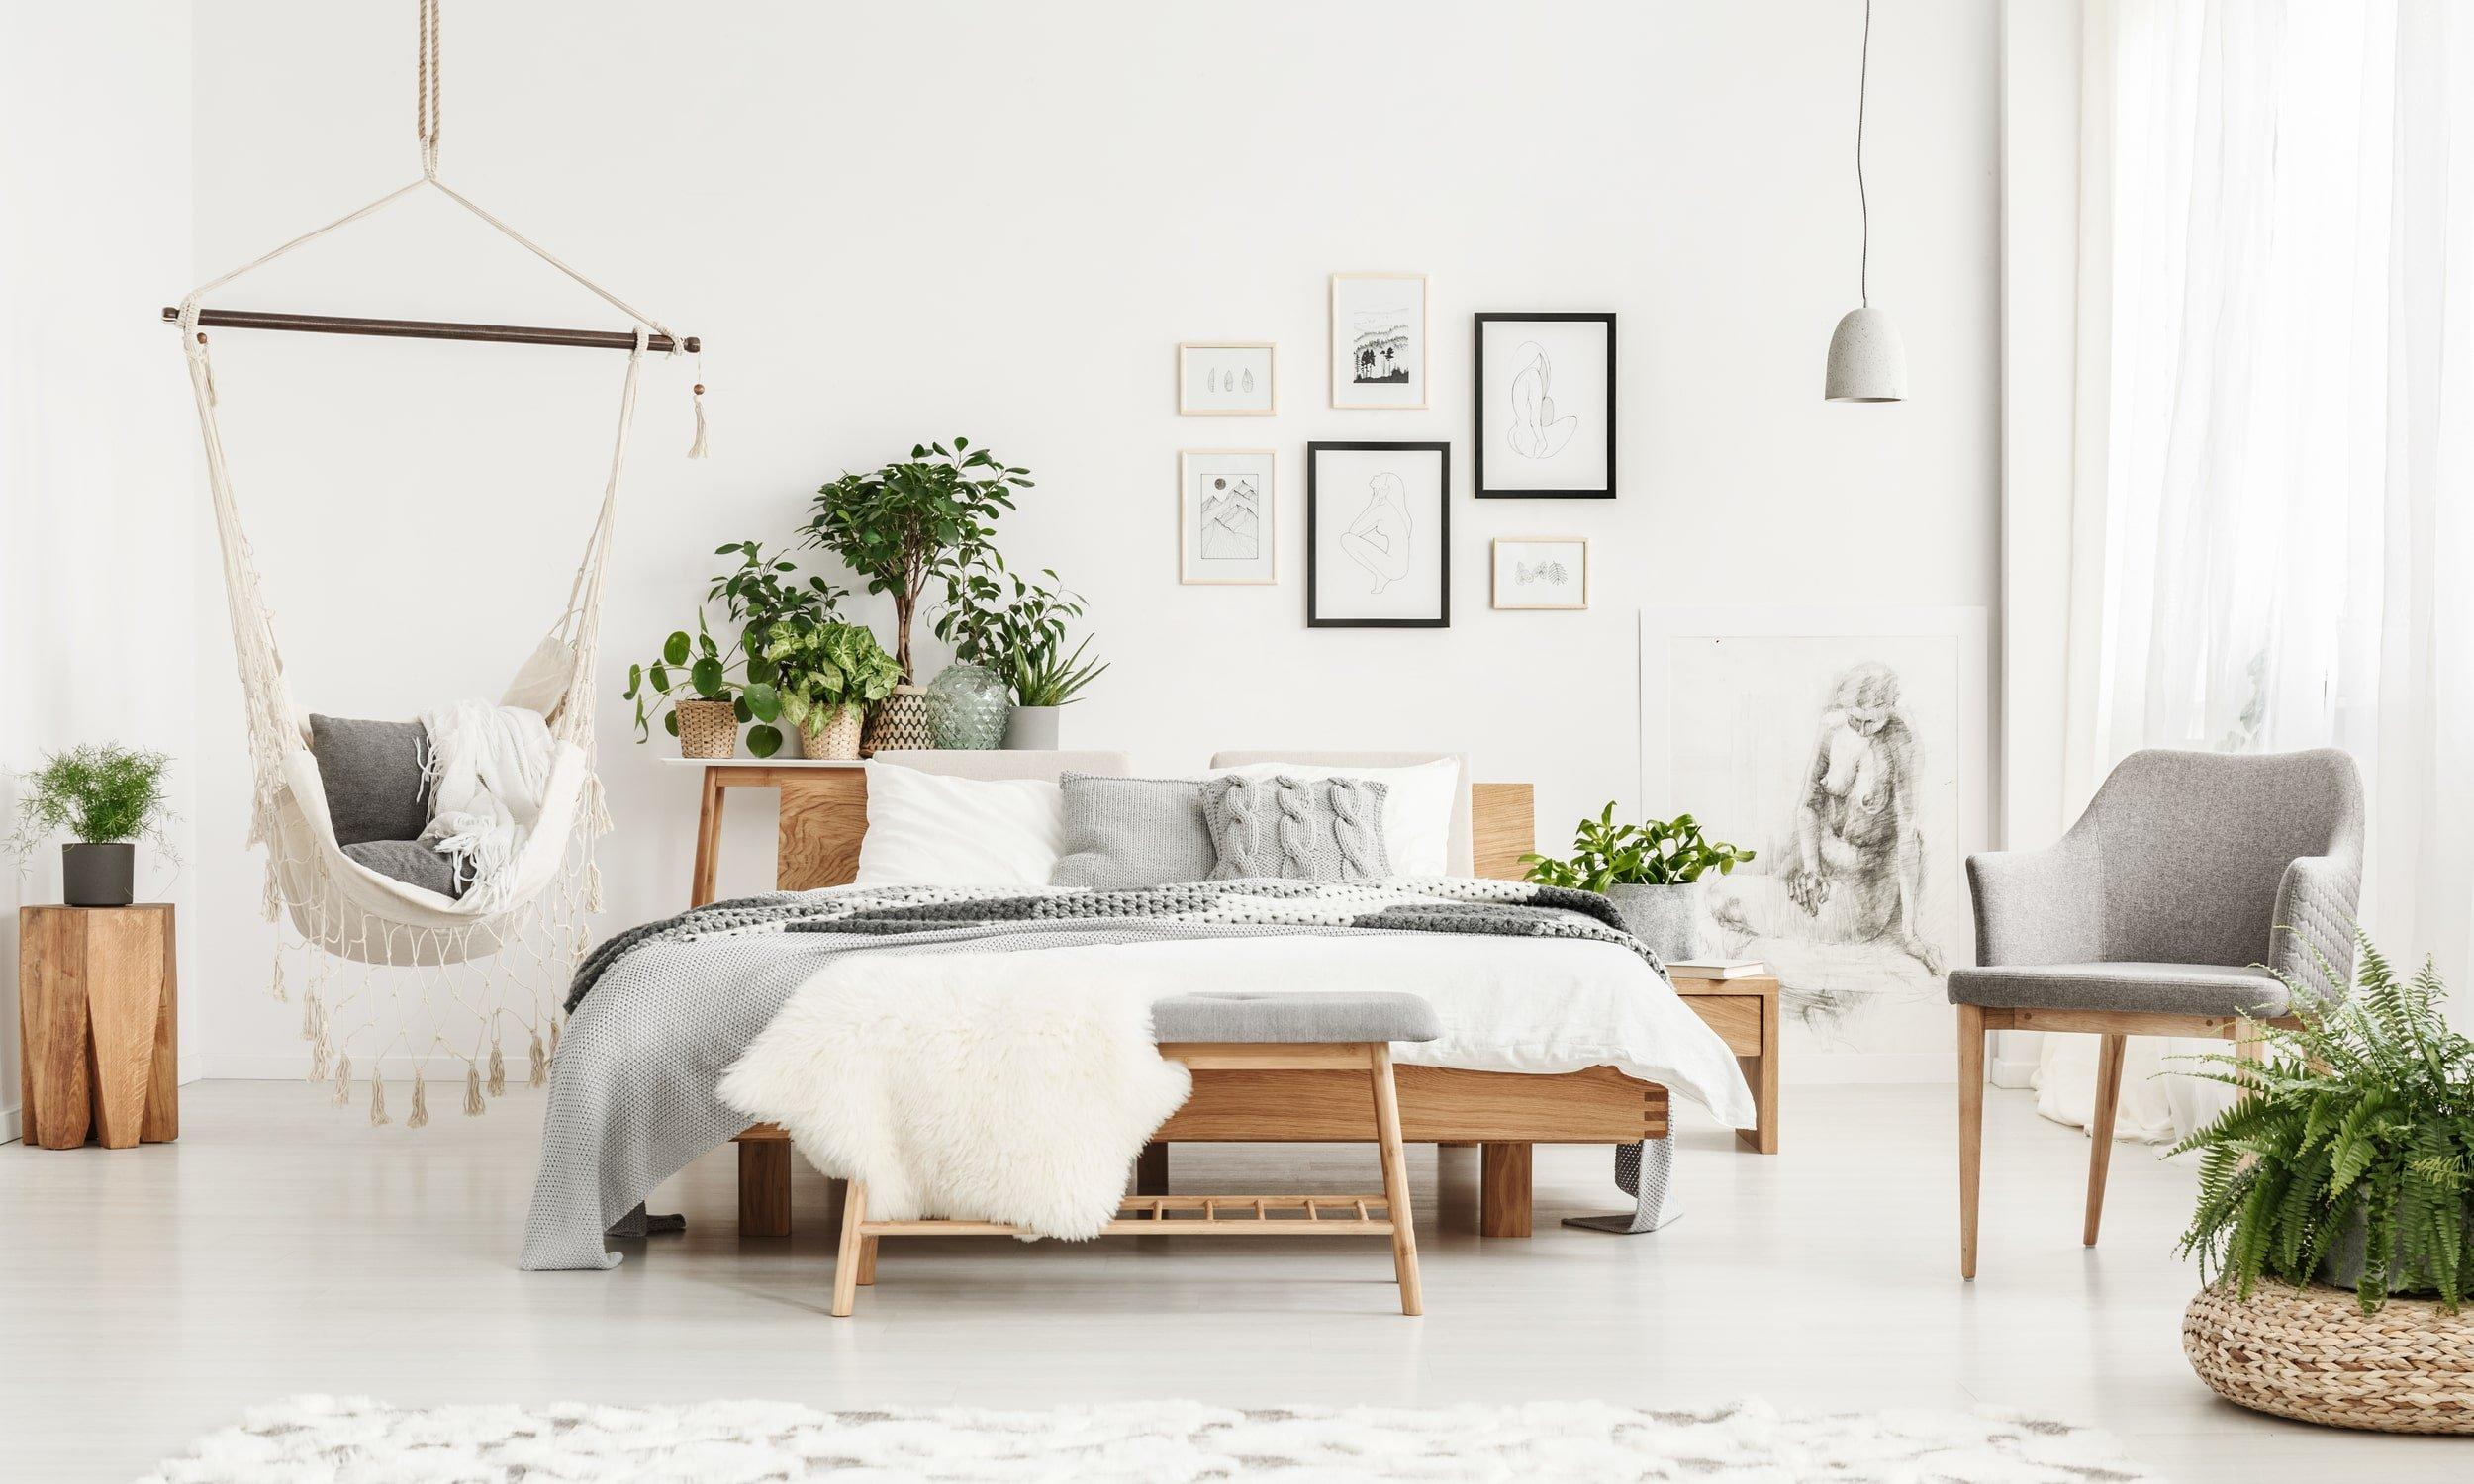 комната в естественном стиле и тенденции